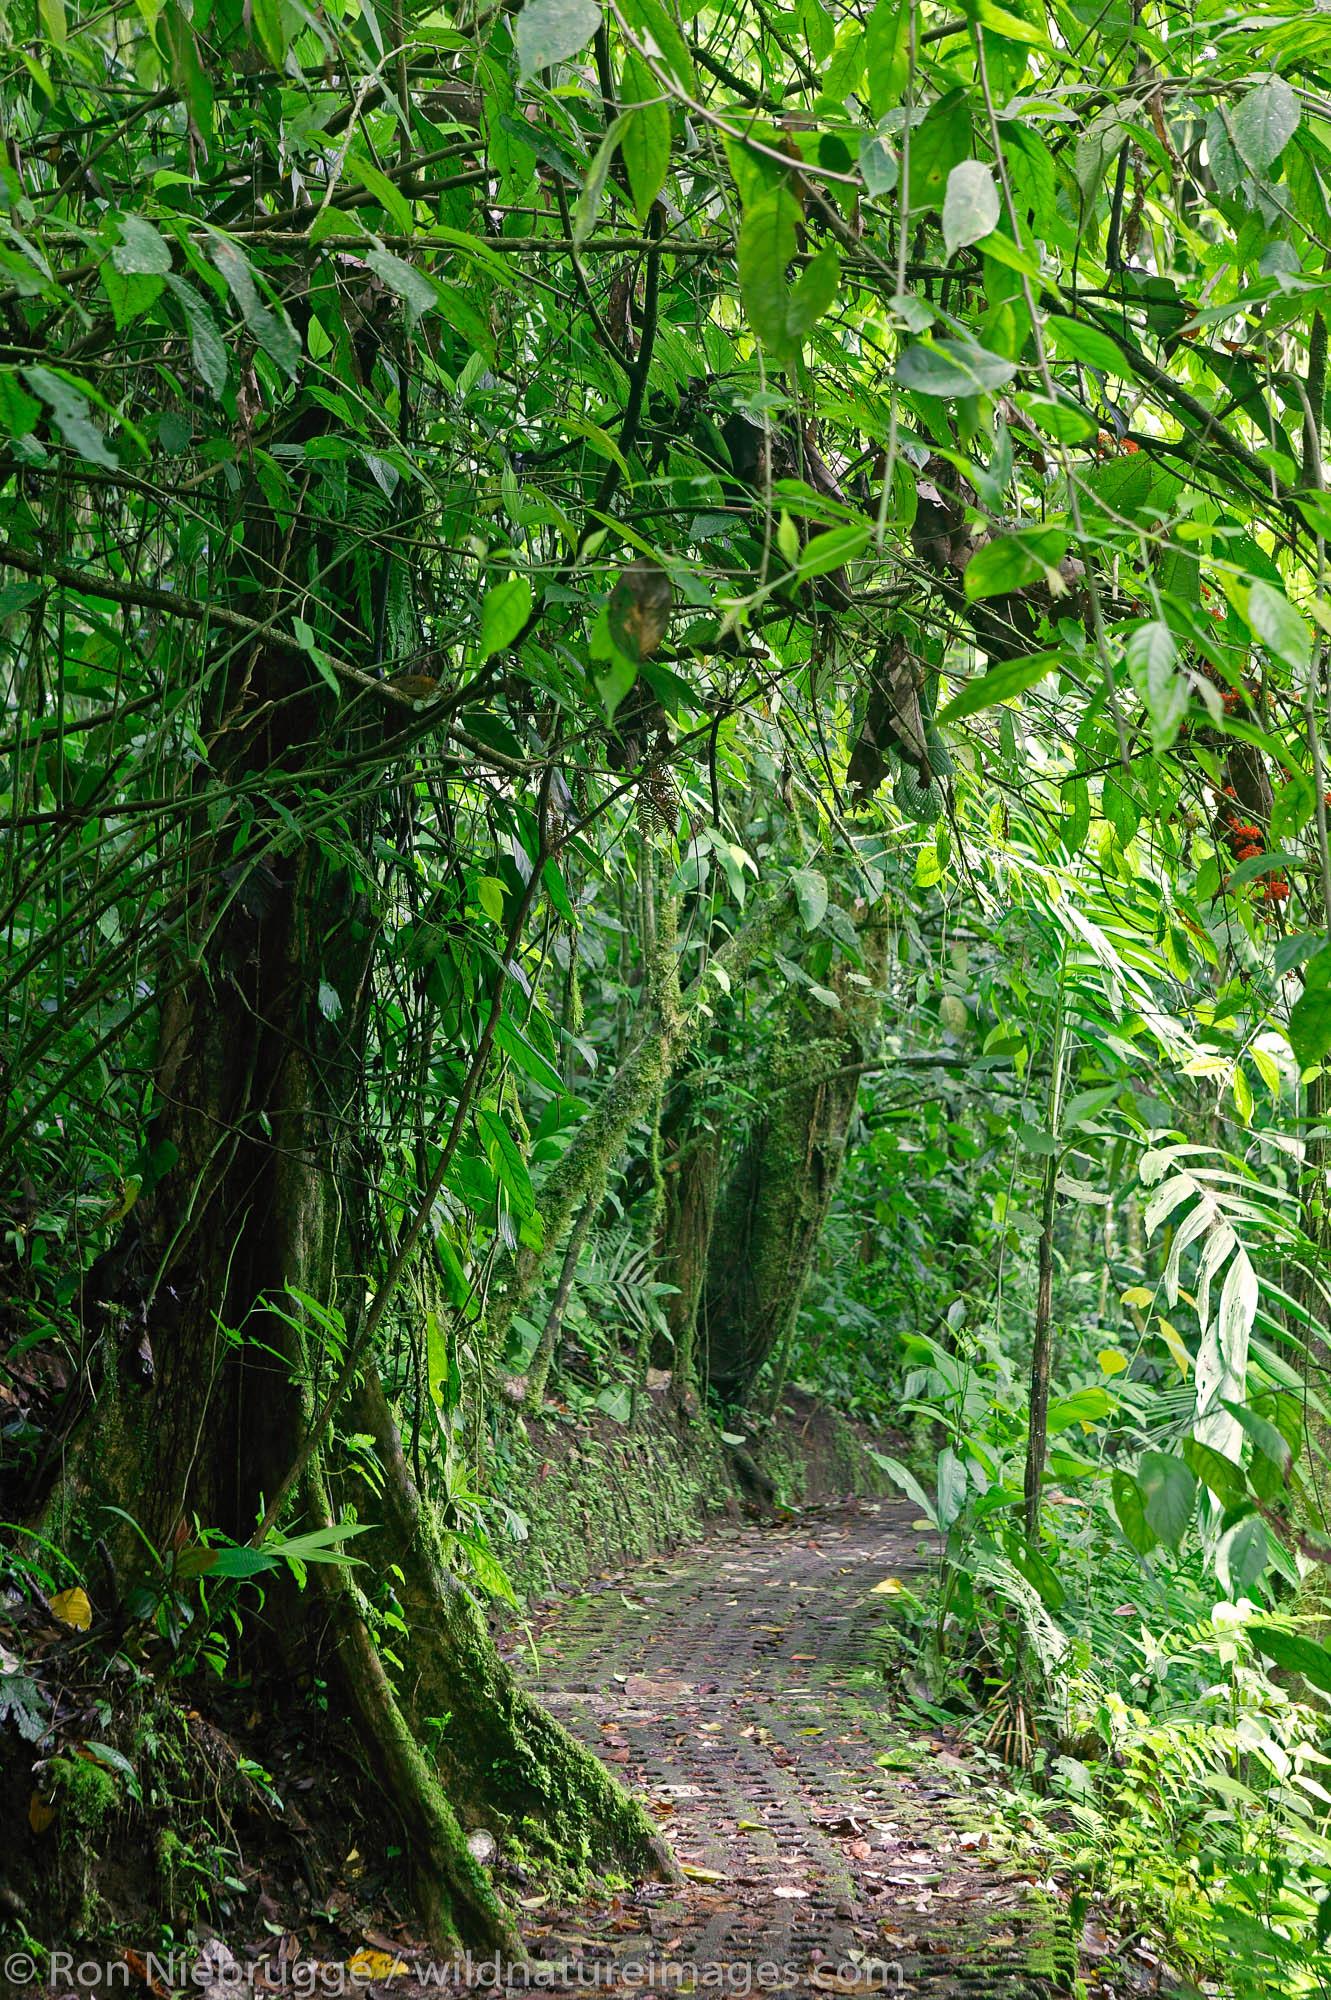 Arenal Hanging Bridges Trail, Arenal, Costa Rica.